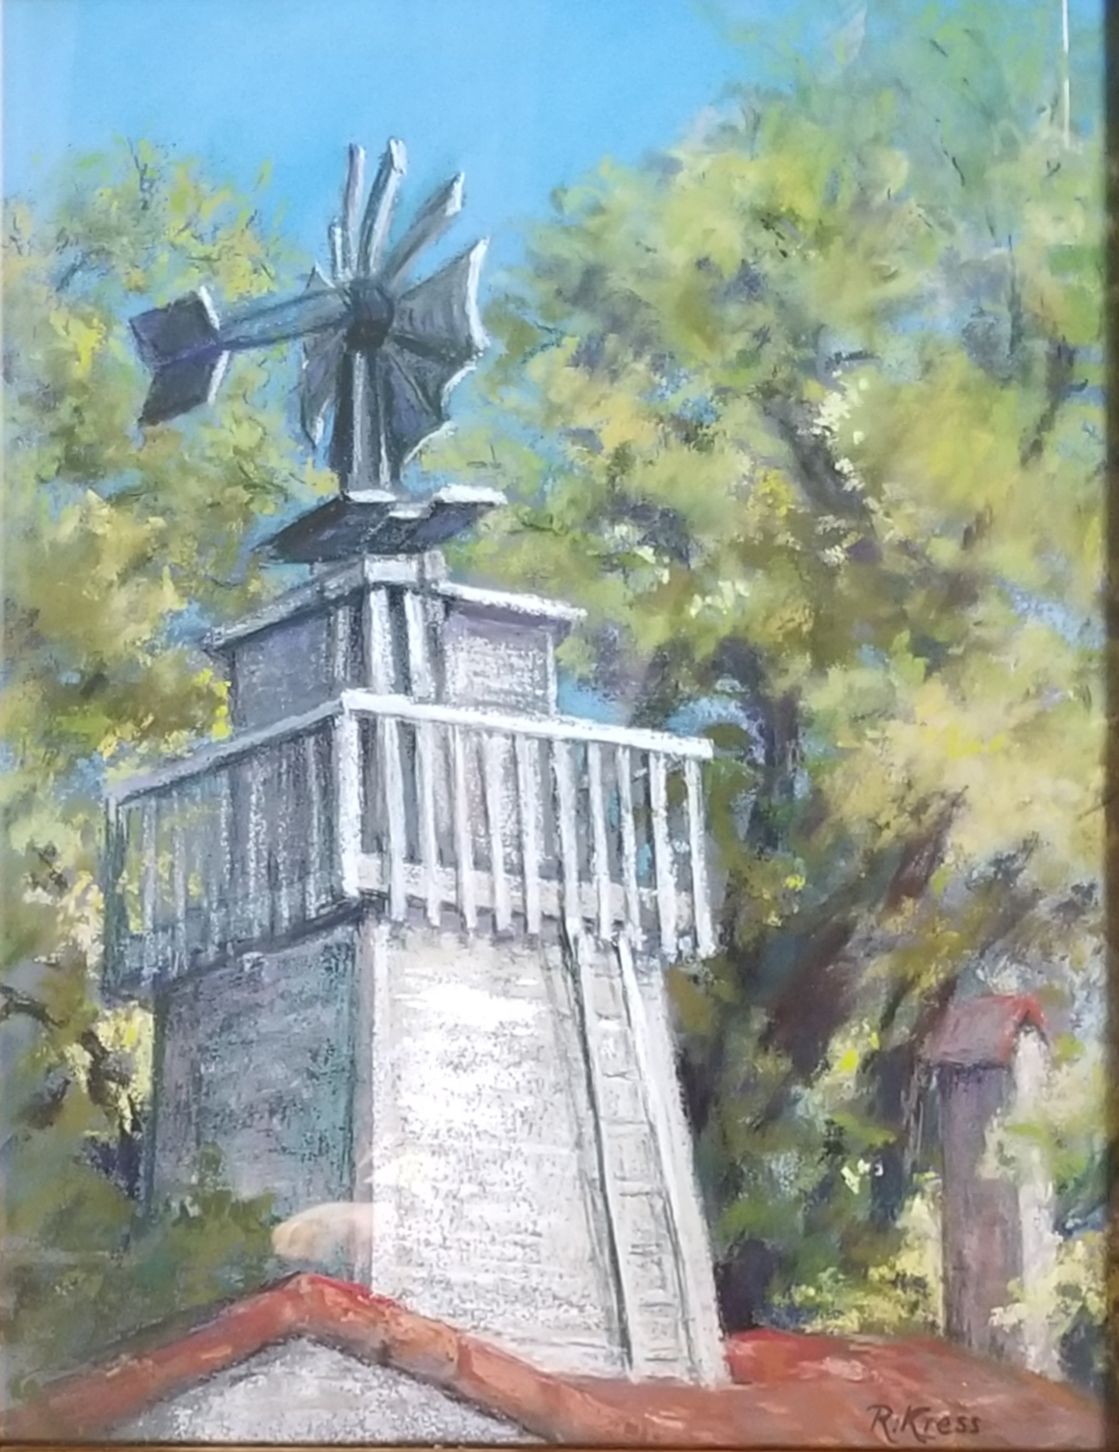 Old Windmill, Roswitha Kress, 19.5 x 16.5, pastel on board, $350